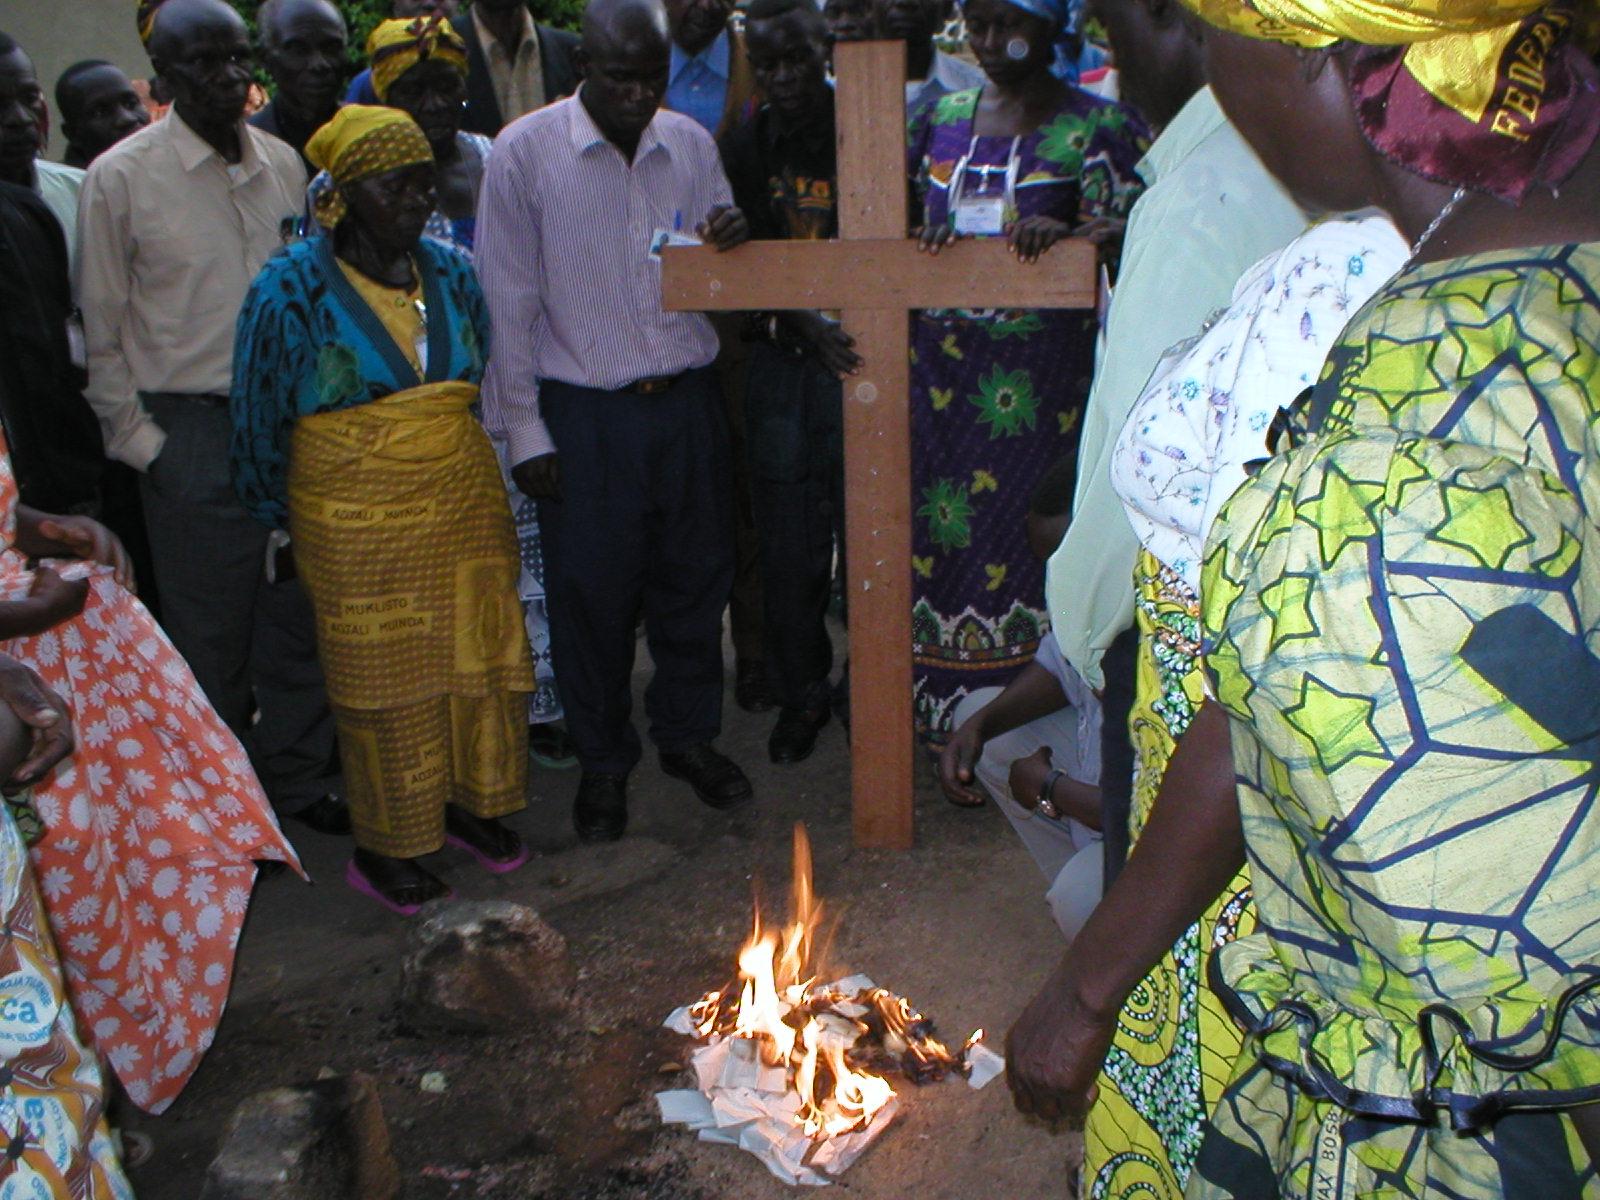 The Burning Ceremony